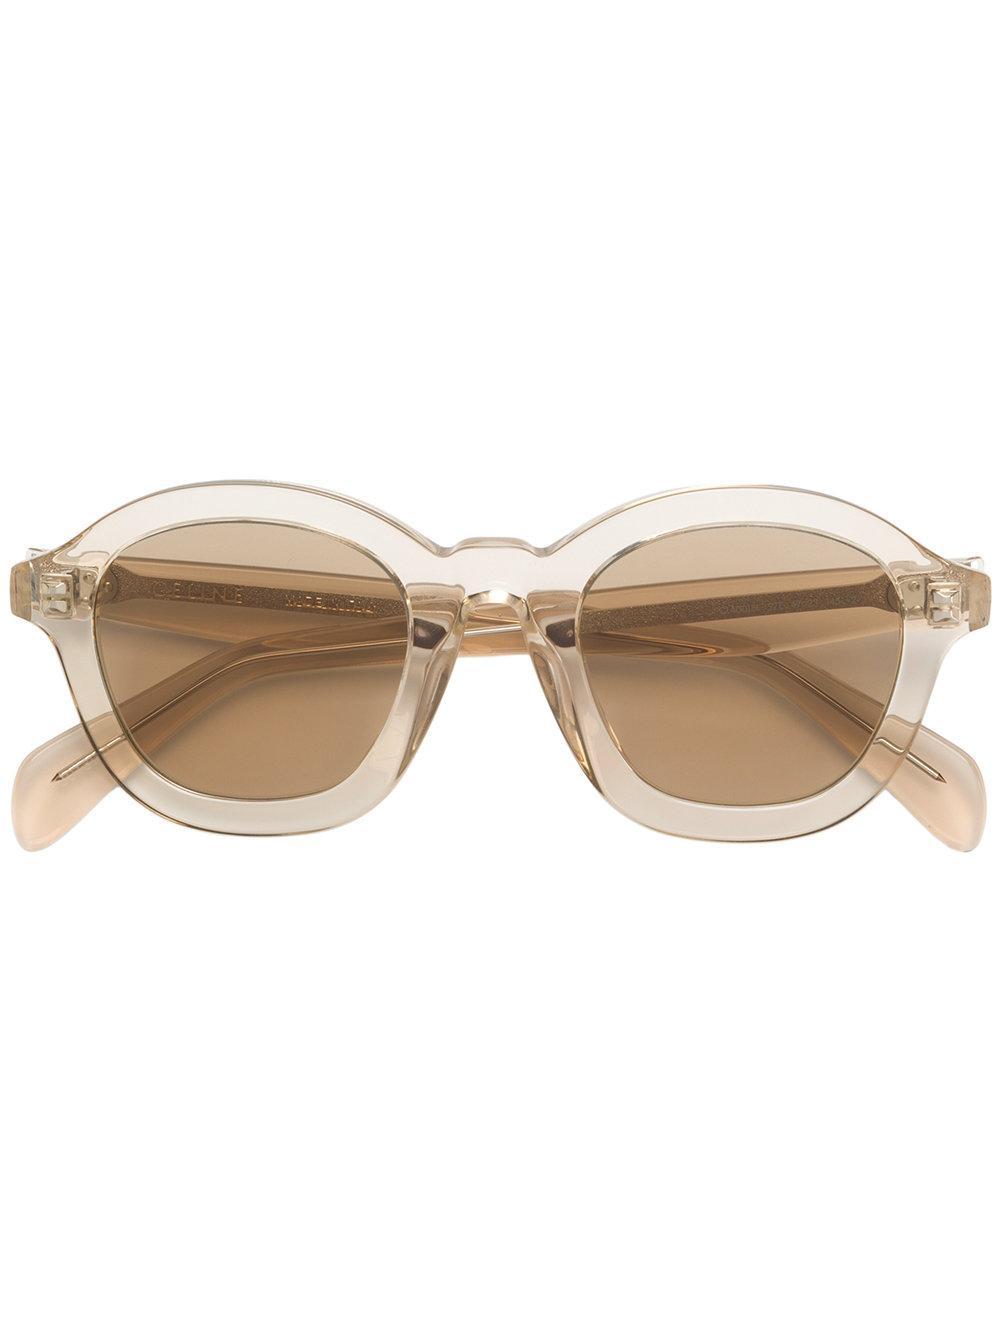 Celine Round Frame Sunglasses In White